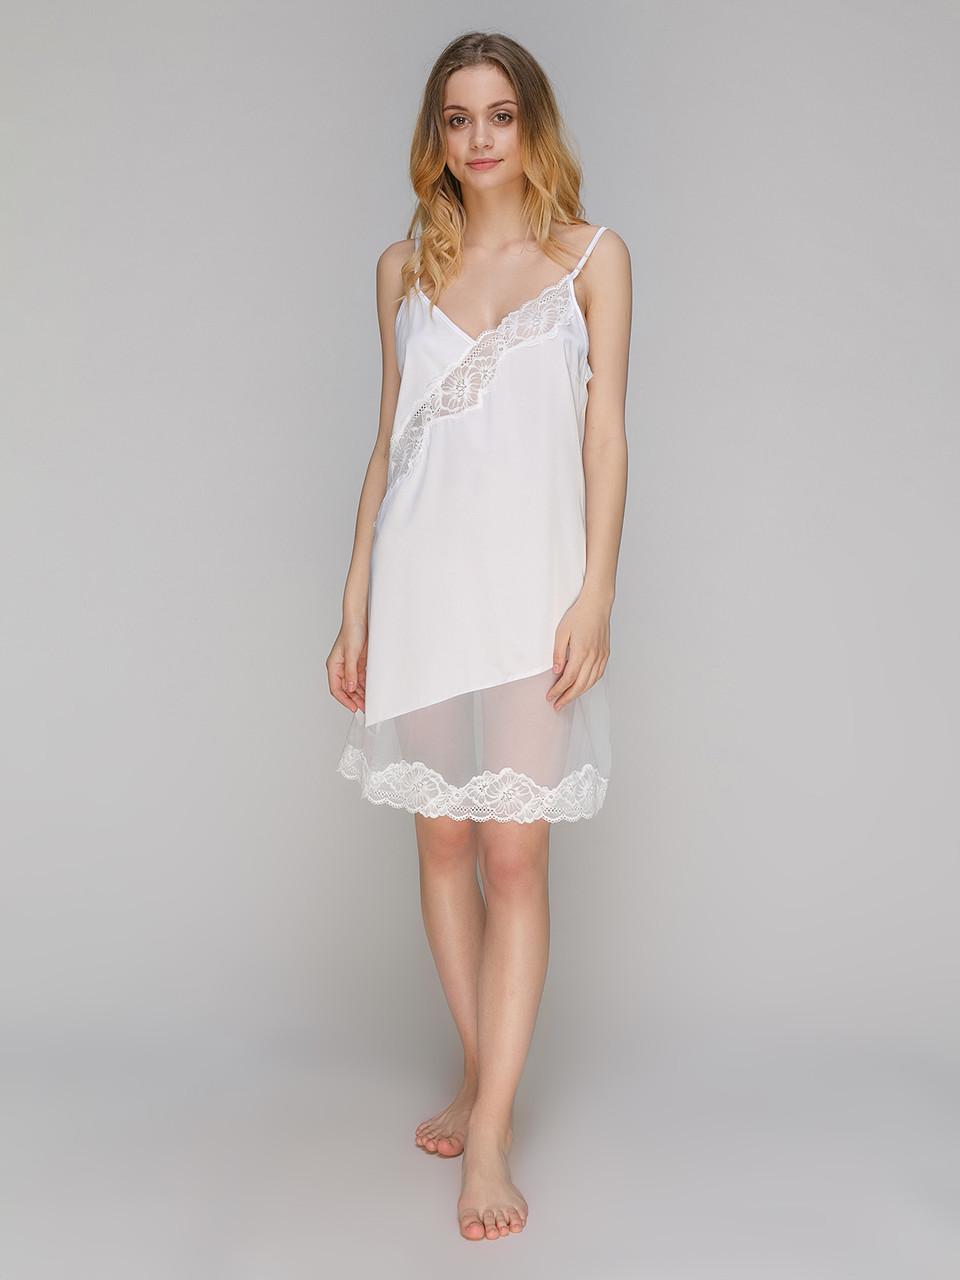 Сорочка Serenade из шелка Армани белая с кружевом